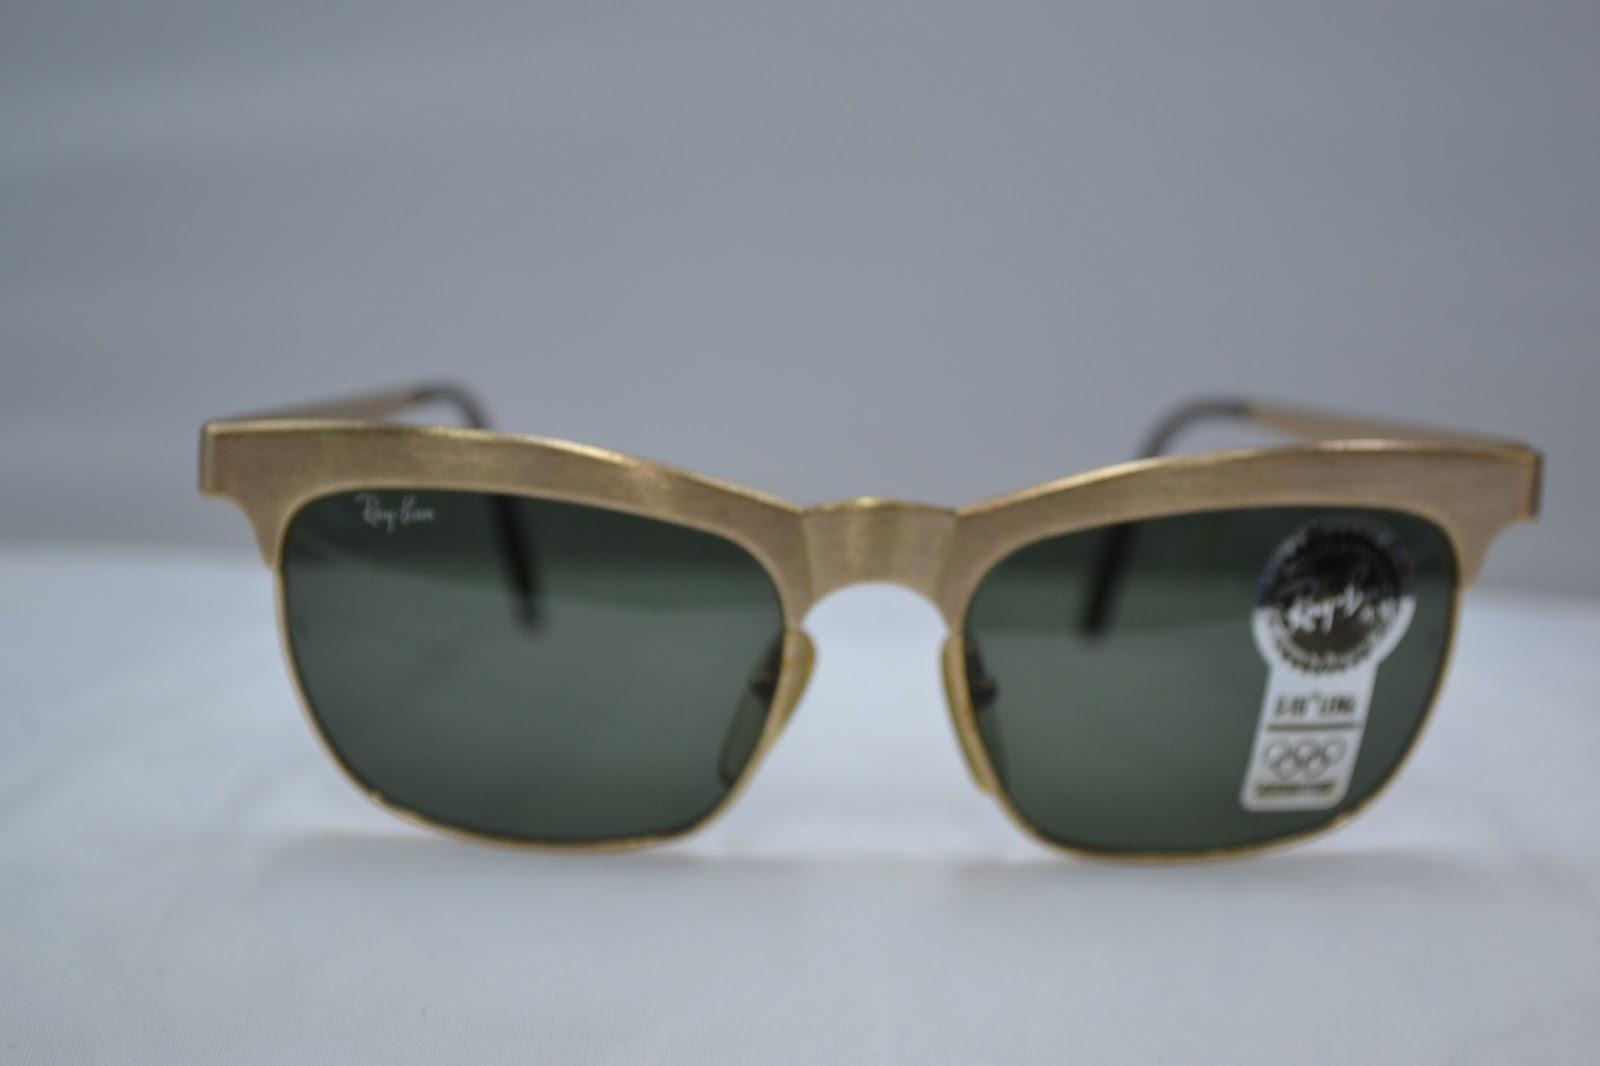 bf44517c4d0 Vintage sunglass  Vintage Ray Ban w0755